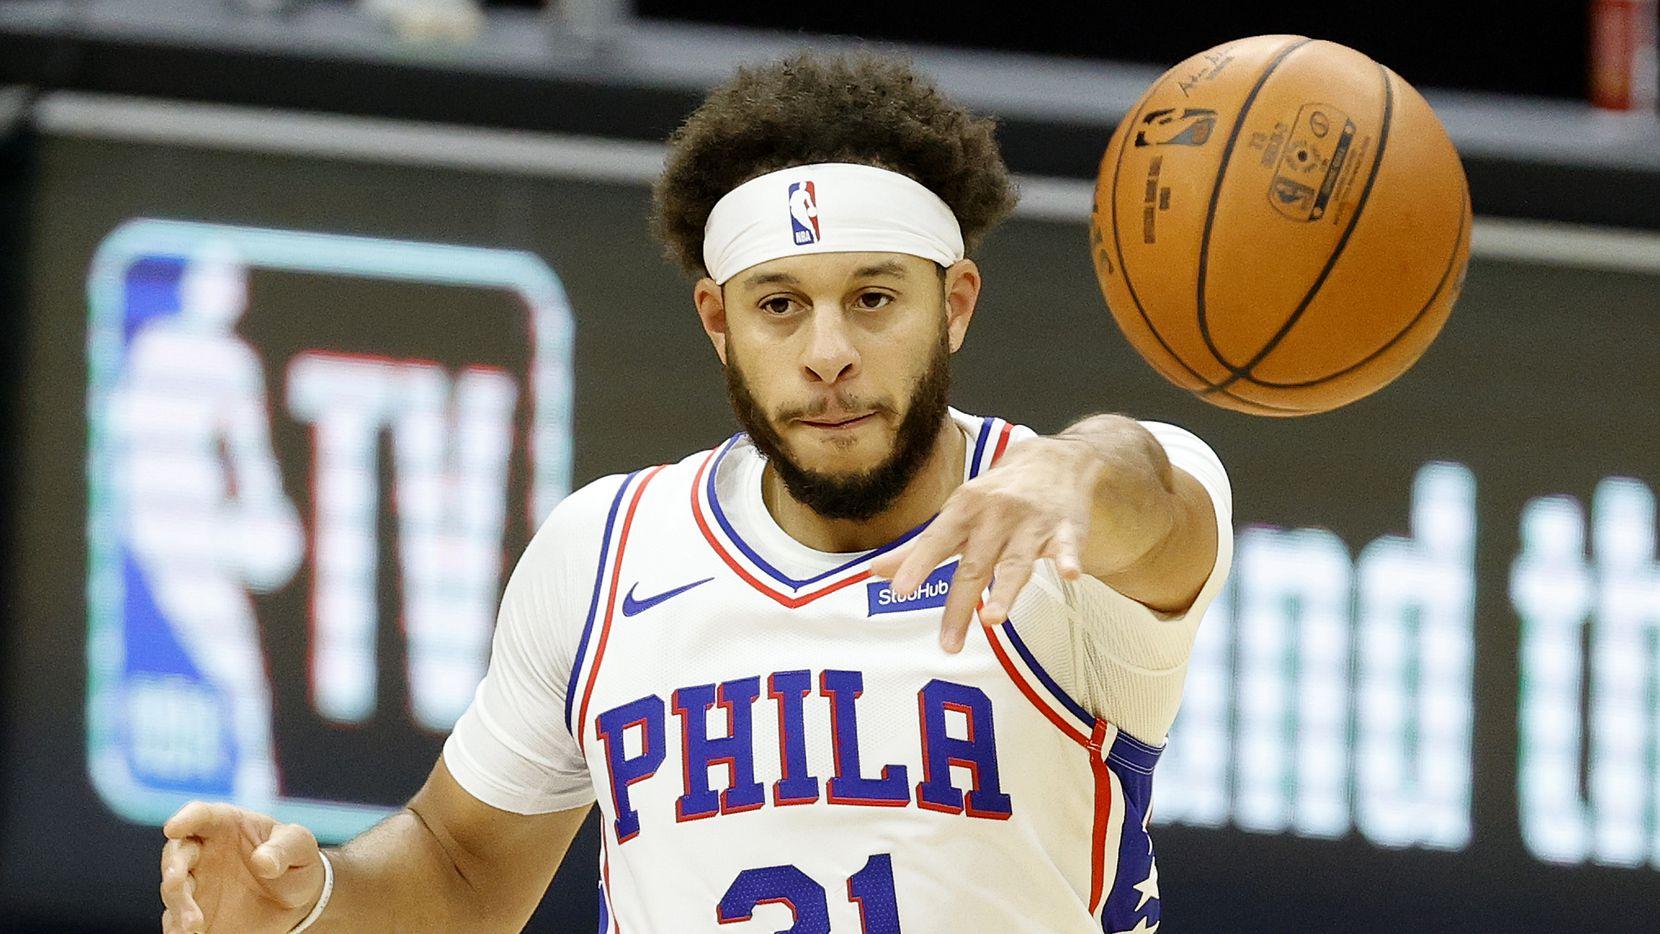 Seth Curry #31 of the Philadelphia 76ers passes the ball during the second quarter against the Boston Celtics at Wells Fargo Center on December 15, 2020 in Philadelphia, Pennsylvania.